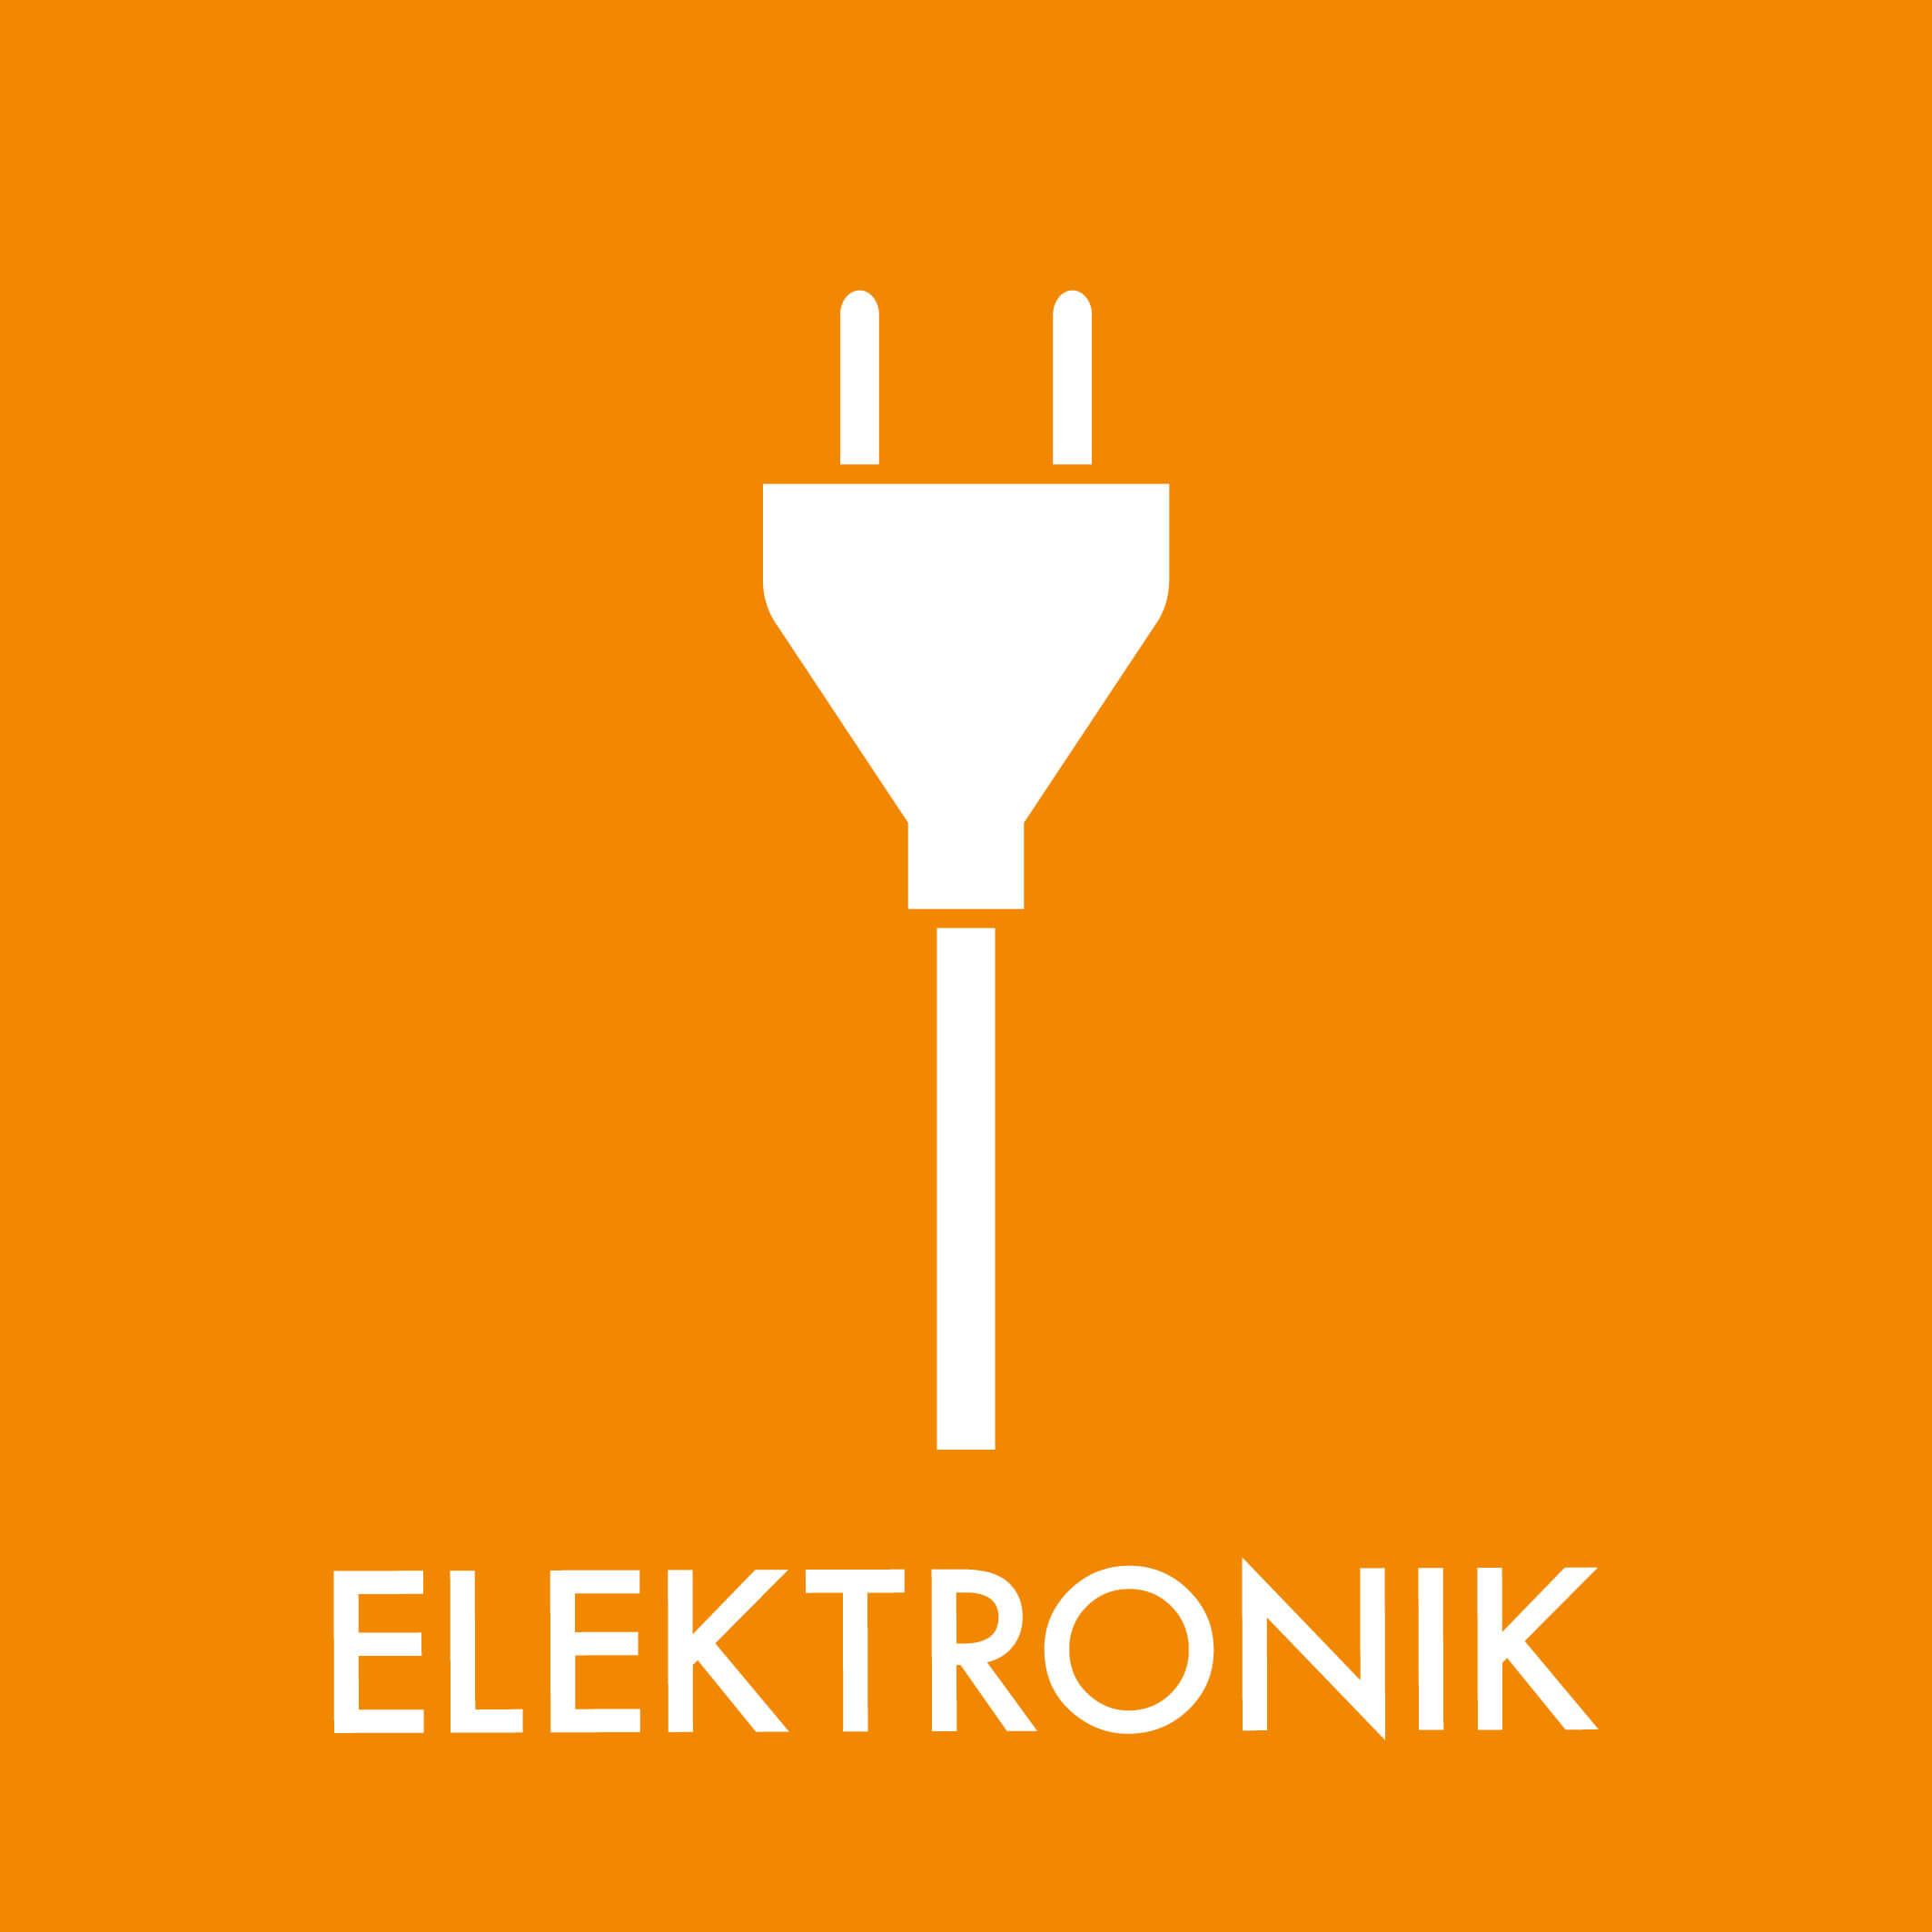 Dansk Affaldssortering - Elektronik